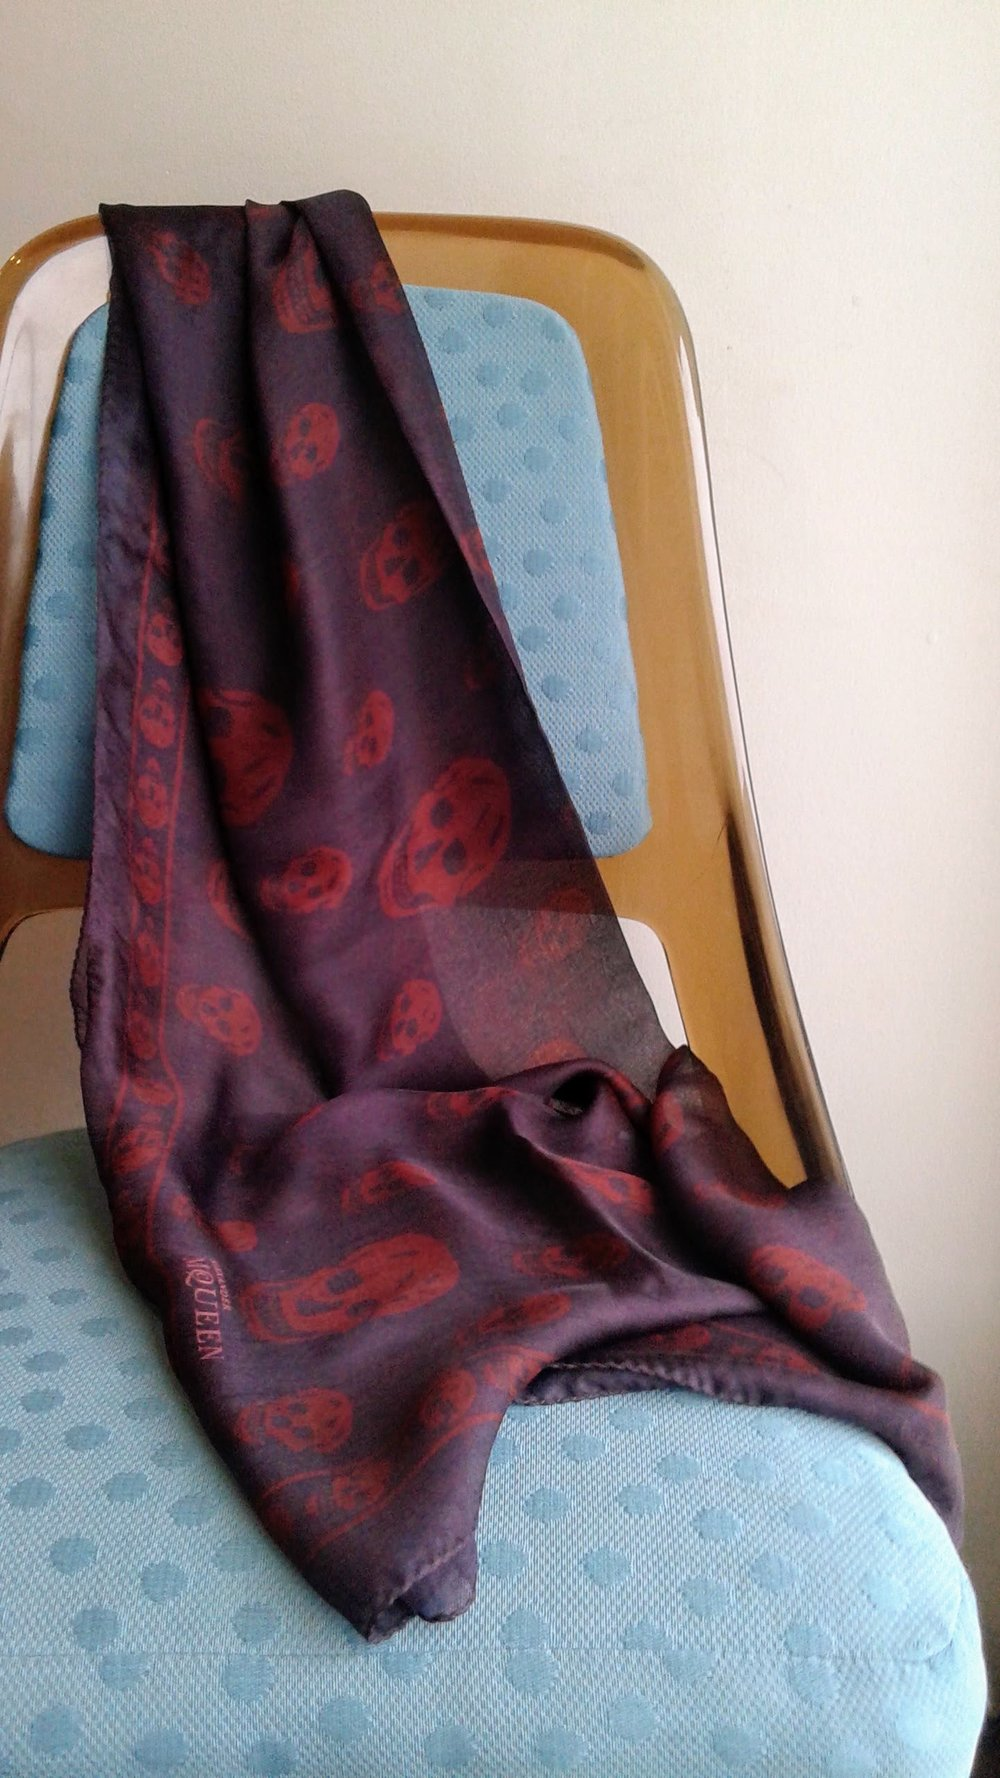 Alexander MCQueen scarf, $125